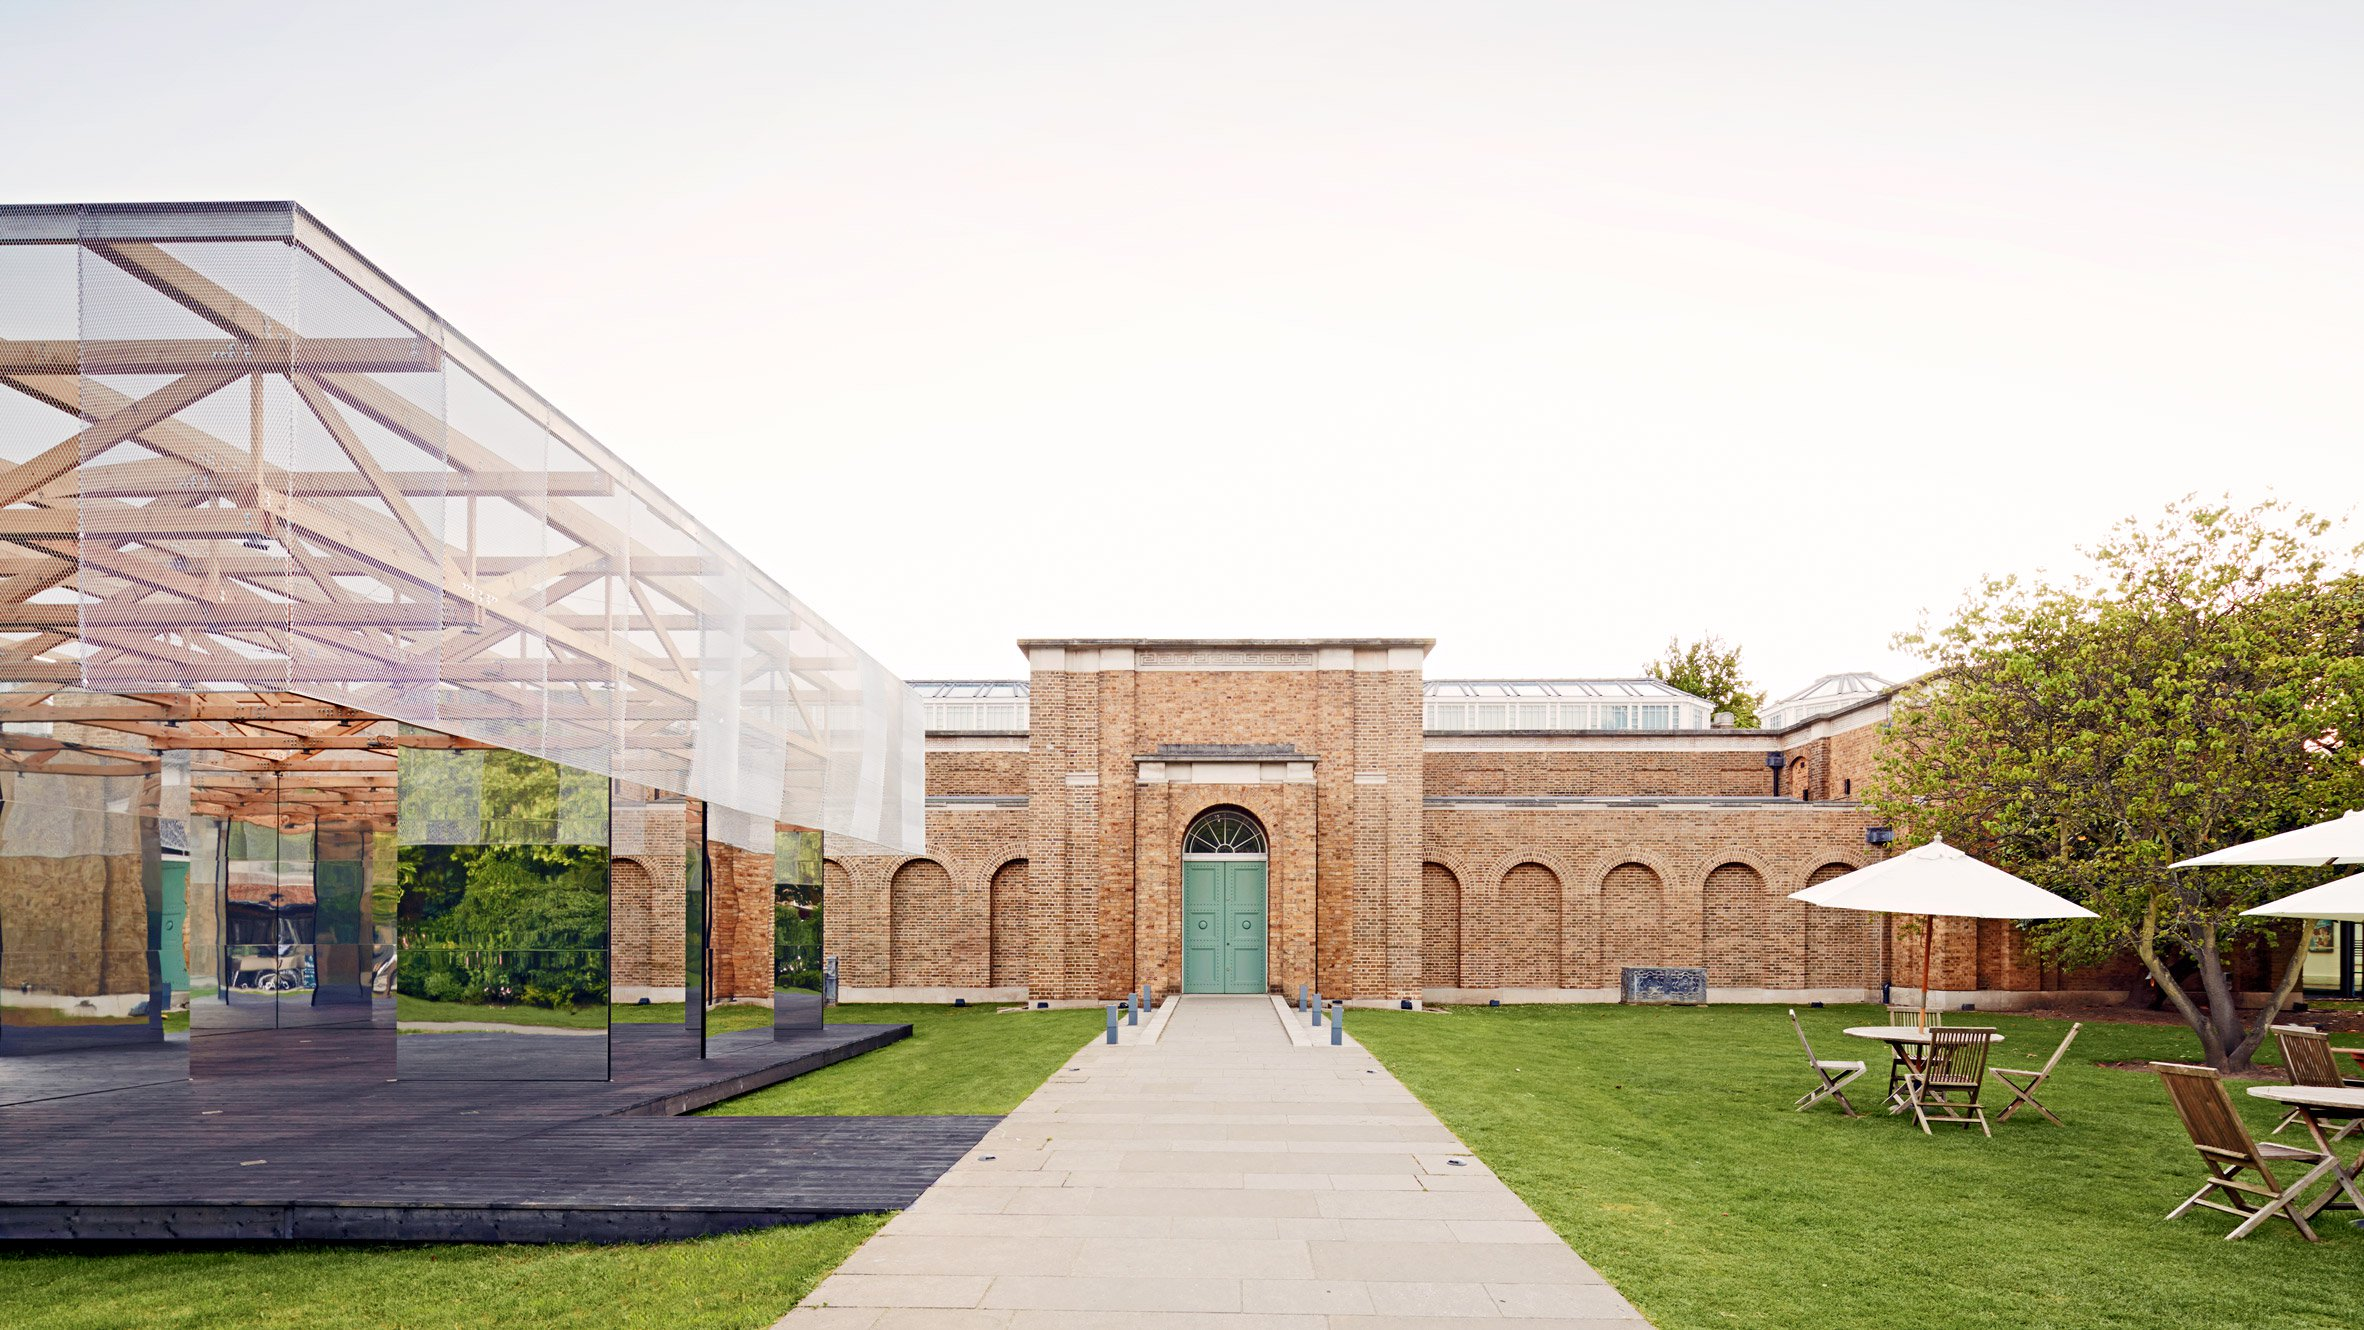 london-festival-of-architecture-dulwich-pavilion-if_do_dezeen_hero-1.jpg